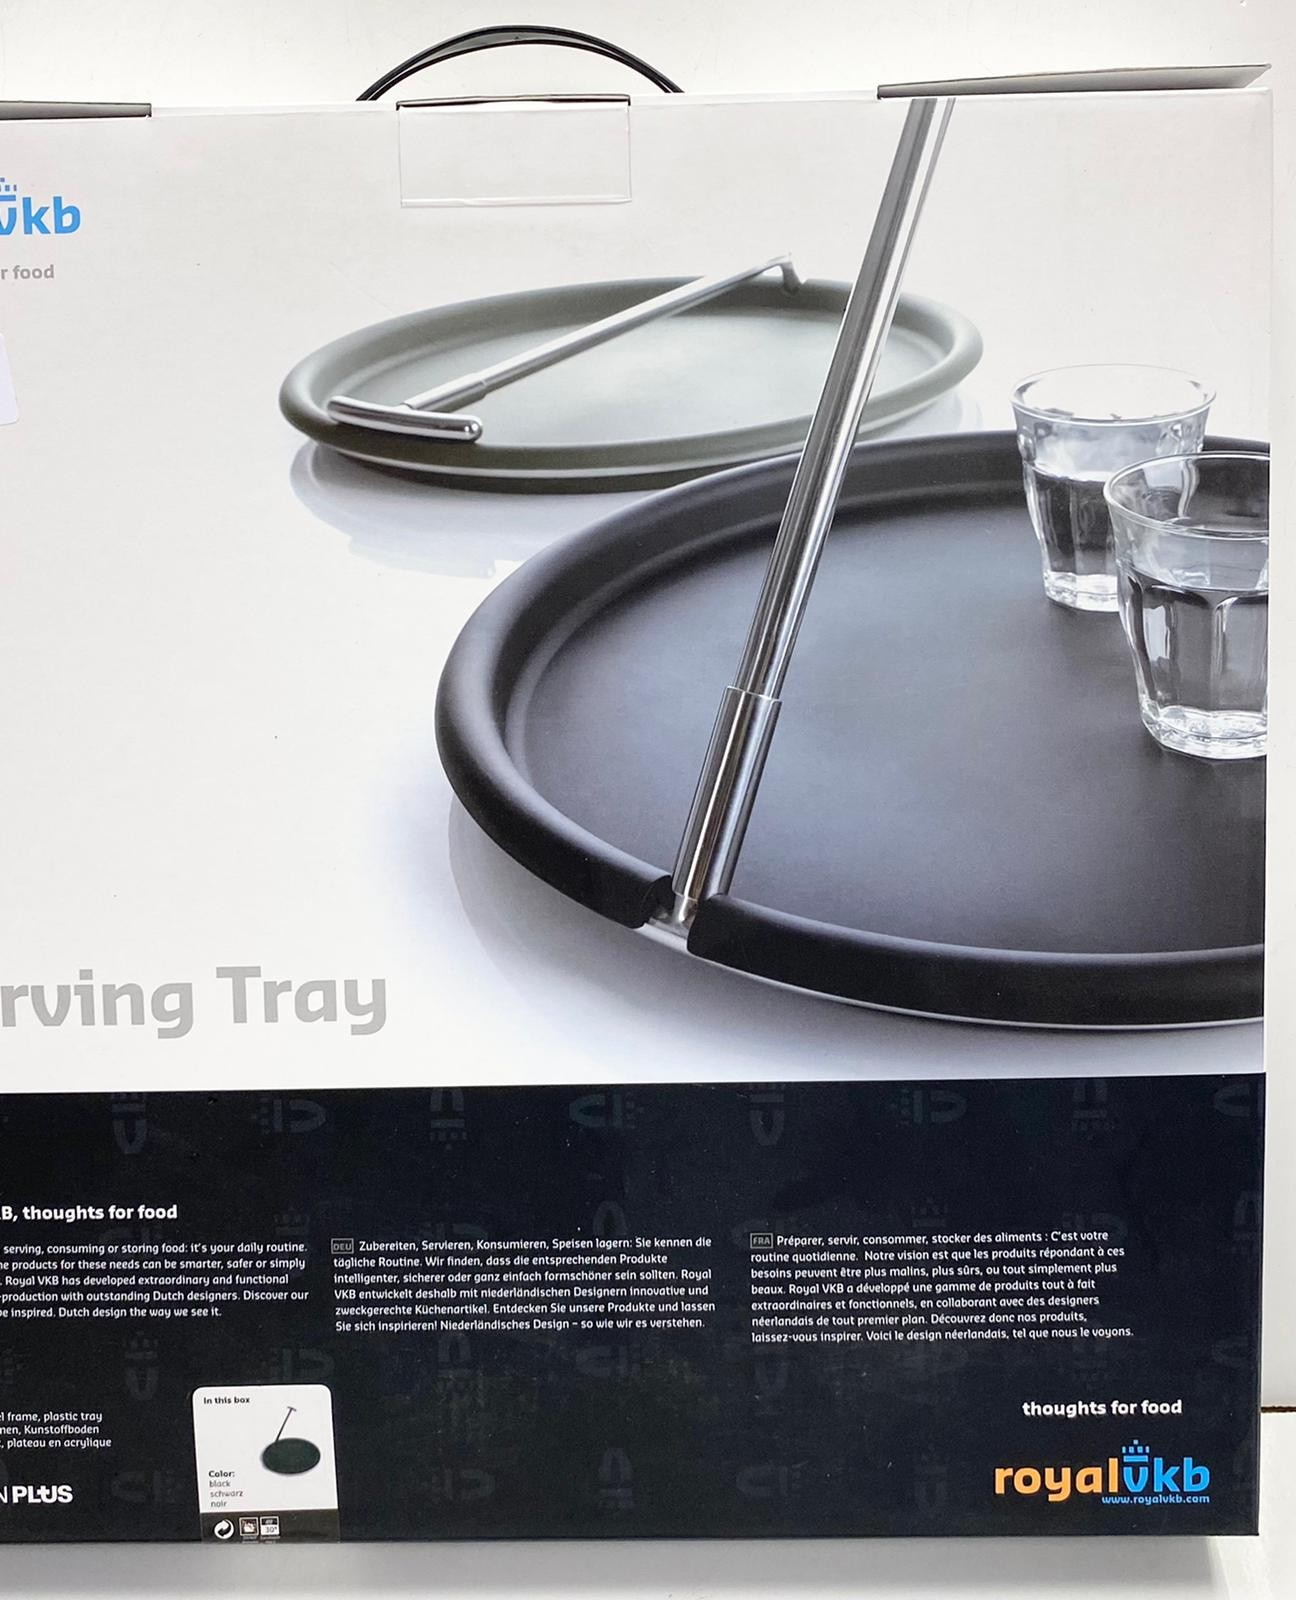 Royal VKB self-balancing serving tray, designed by Gijs Bakkar. Brand new in box, unused. - Image 2 of 2